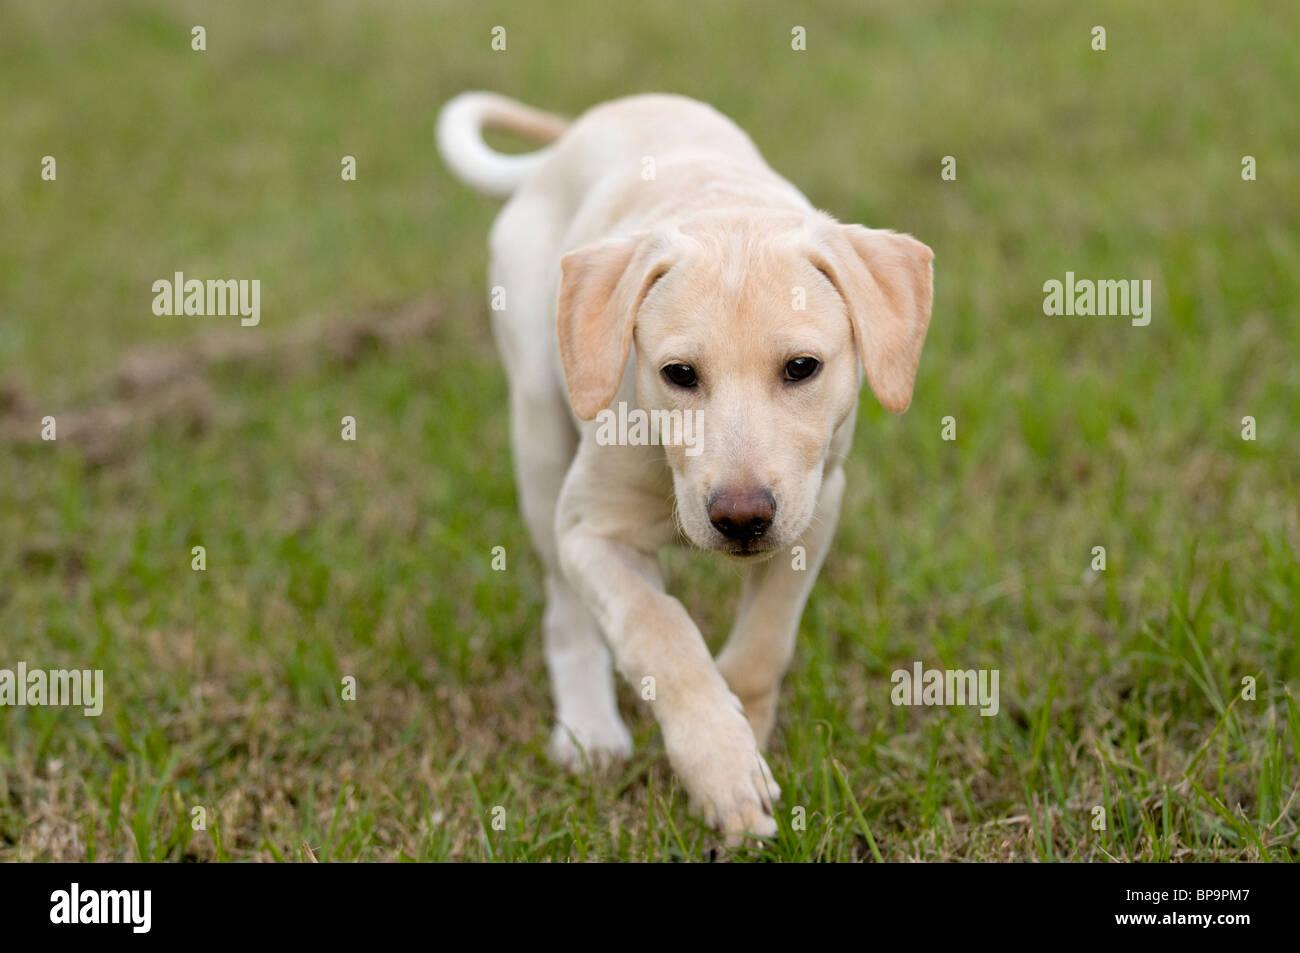 Labrador puppy dog - Stock Image